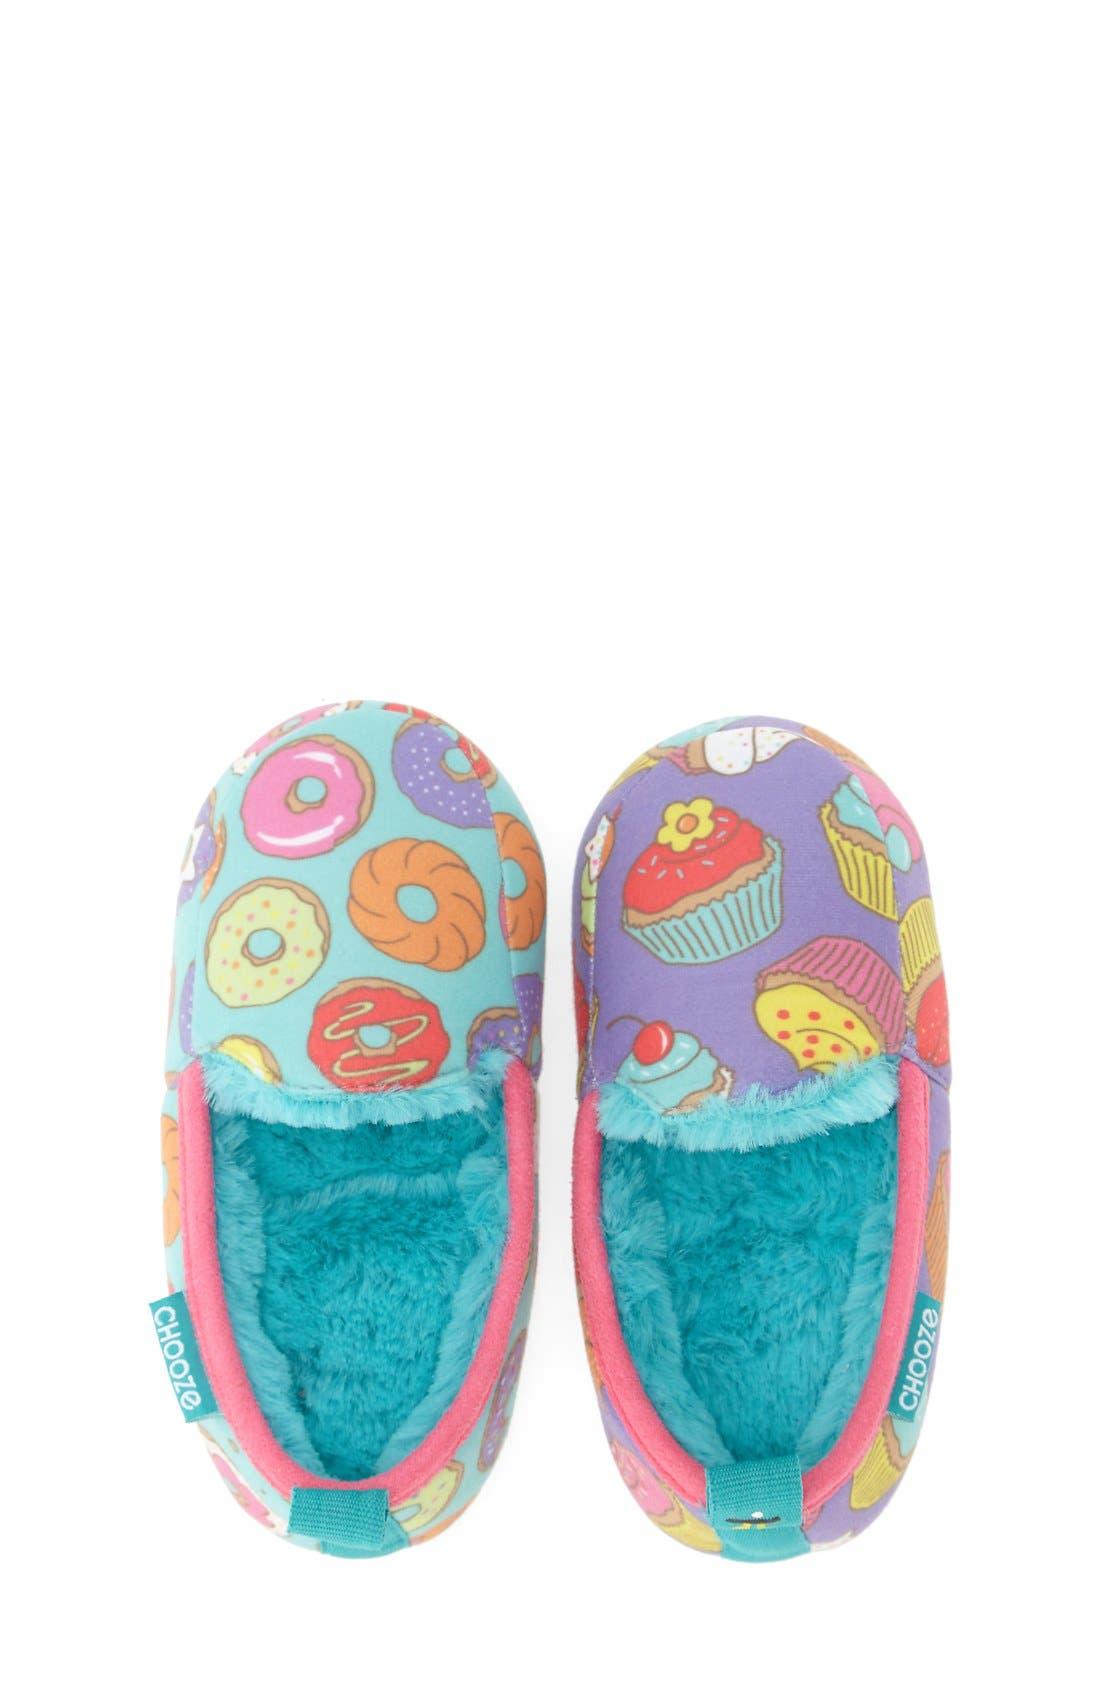 Alternate Image 3  - CHOOZE 'Slumber' Slippers (Toddler, Little Kid & Big Kid)